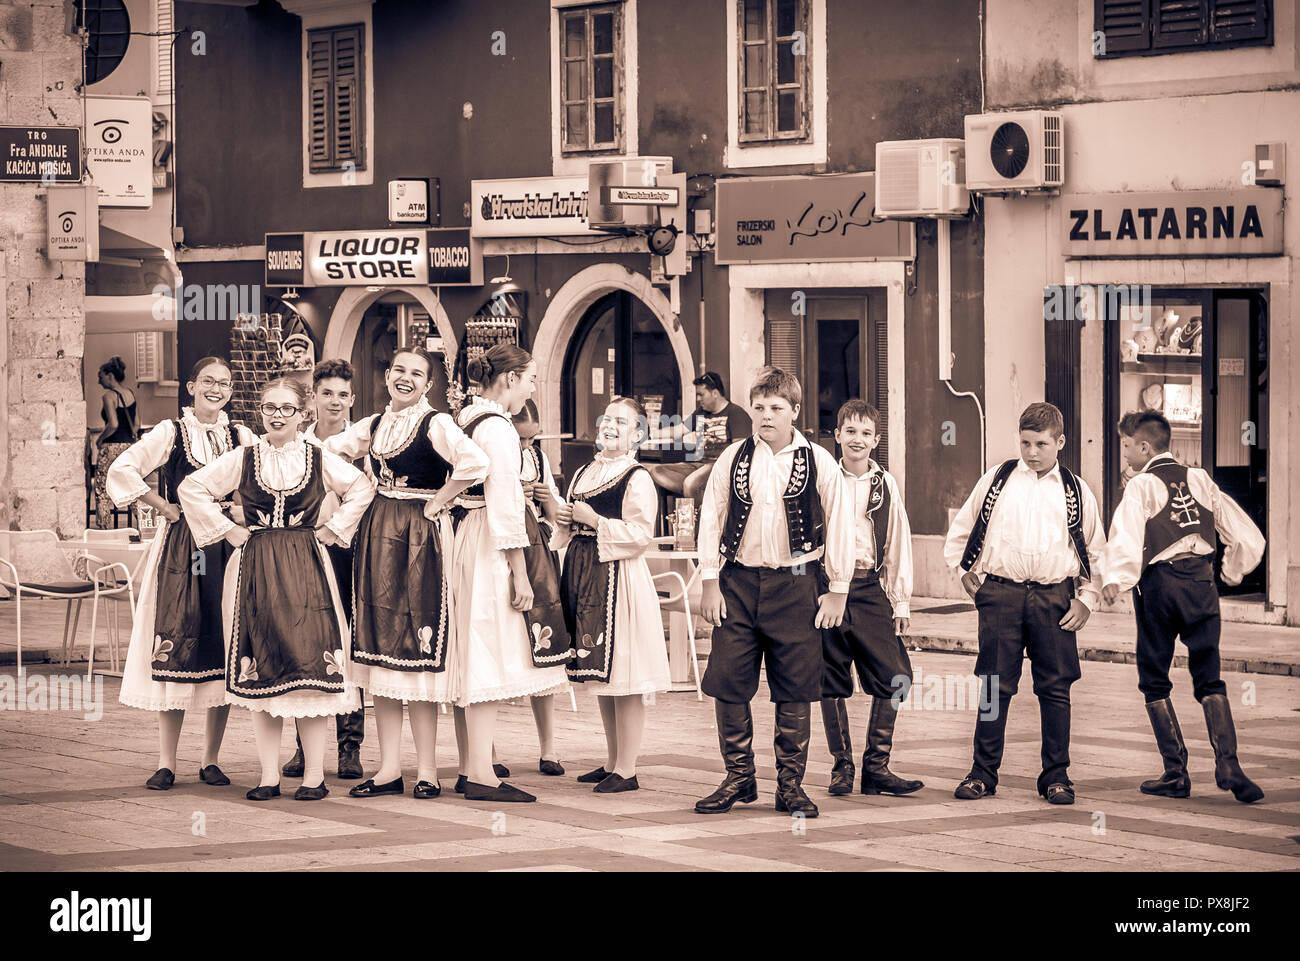 MAKARSKA, CROATIA - JULY 19, 2018: Young artists wearing national costumes prepare for a street performance in Makarska city, Croatia Stock Photo